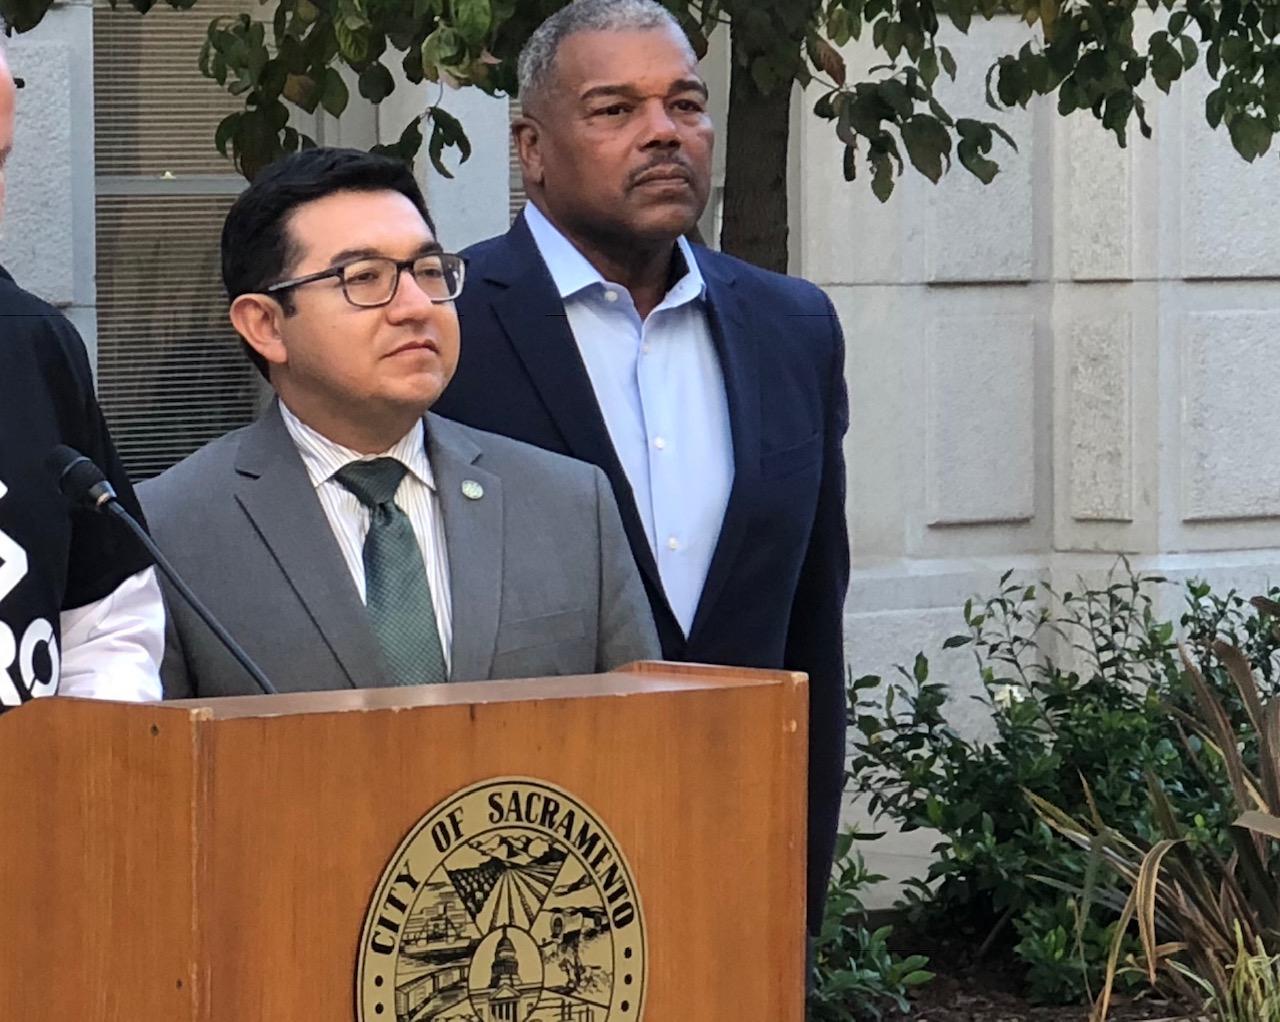 Sacramento Councilmember Eric Guerra (left) with Councilmember Rick Jennings